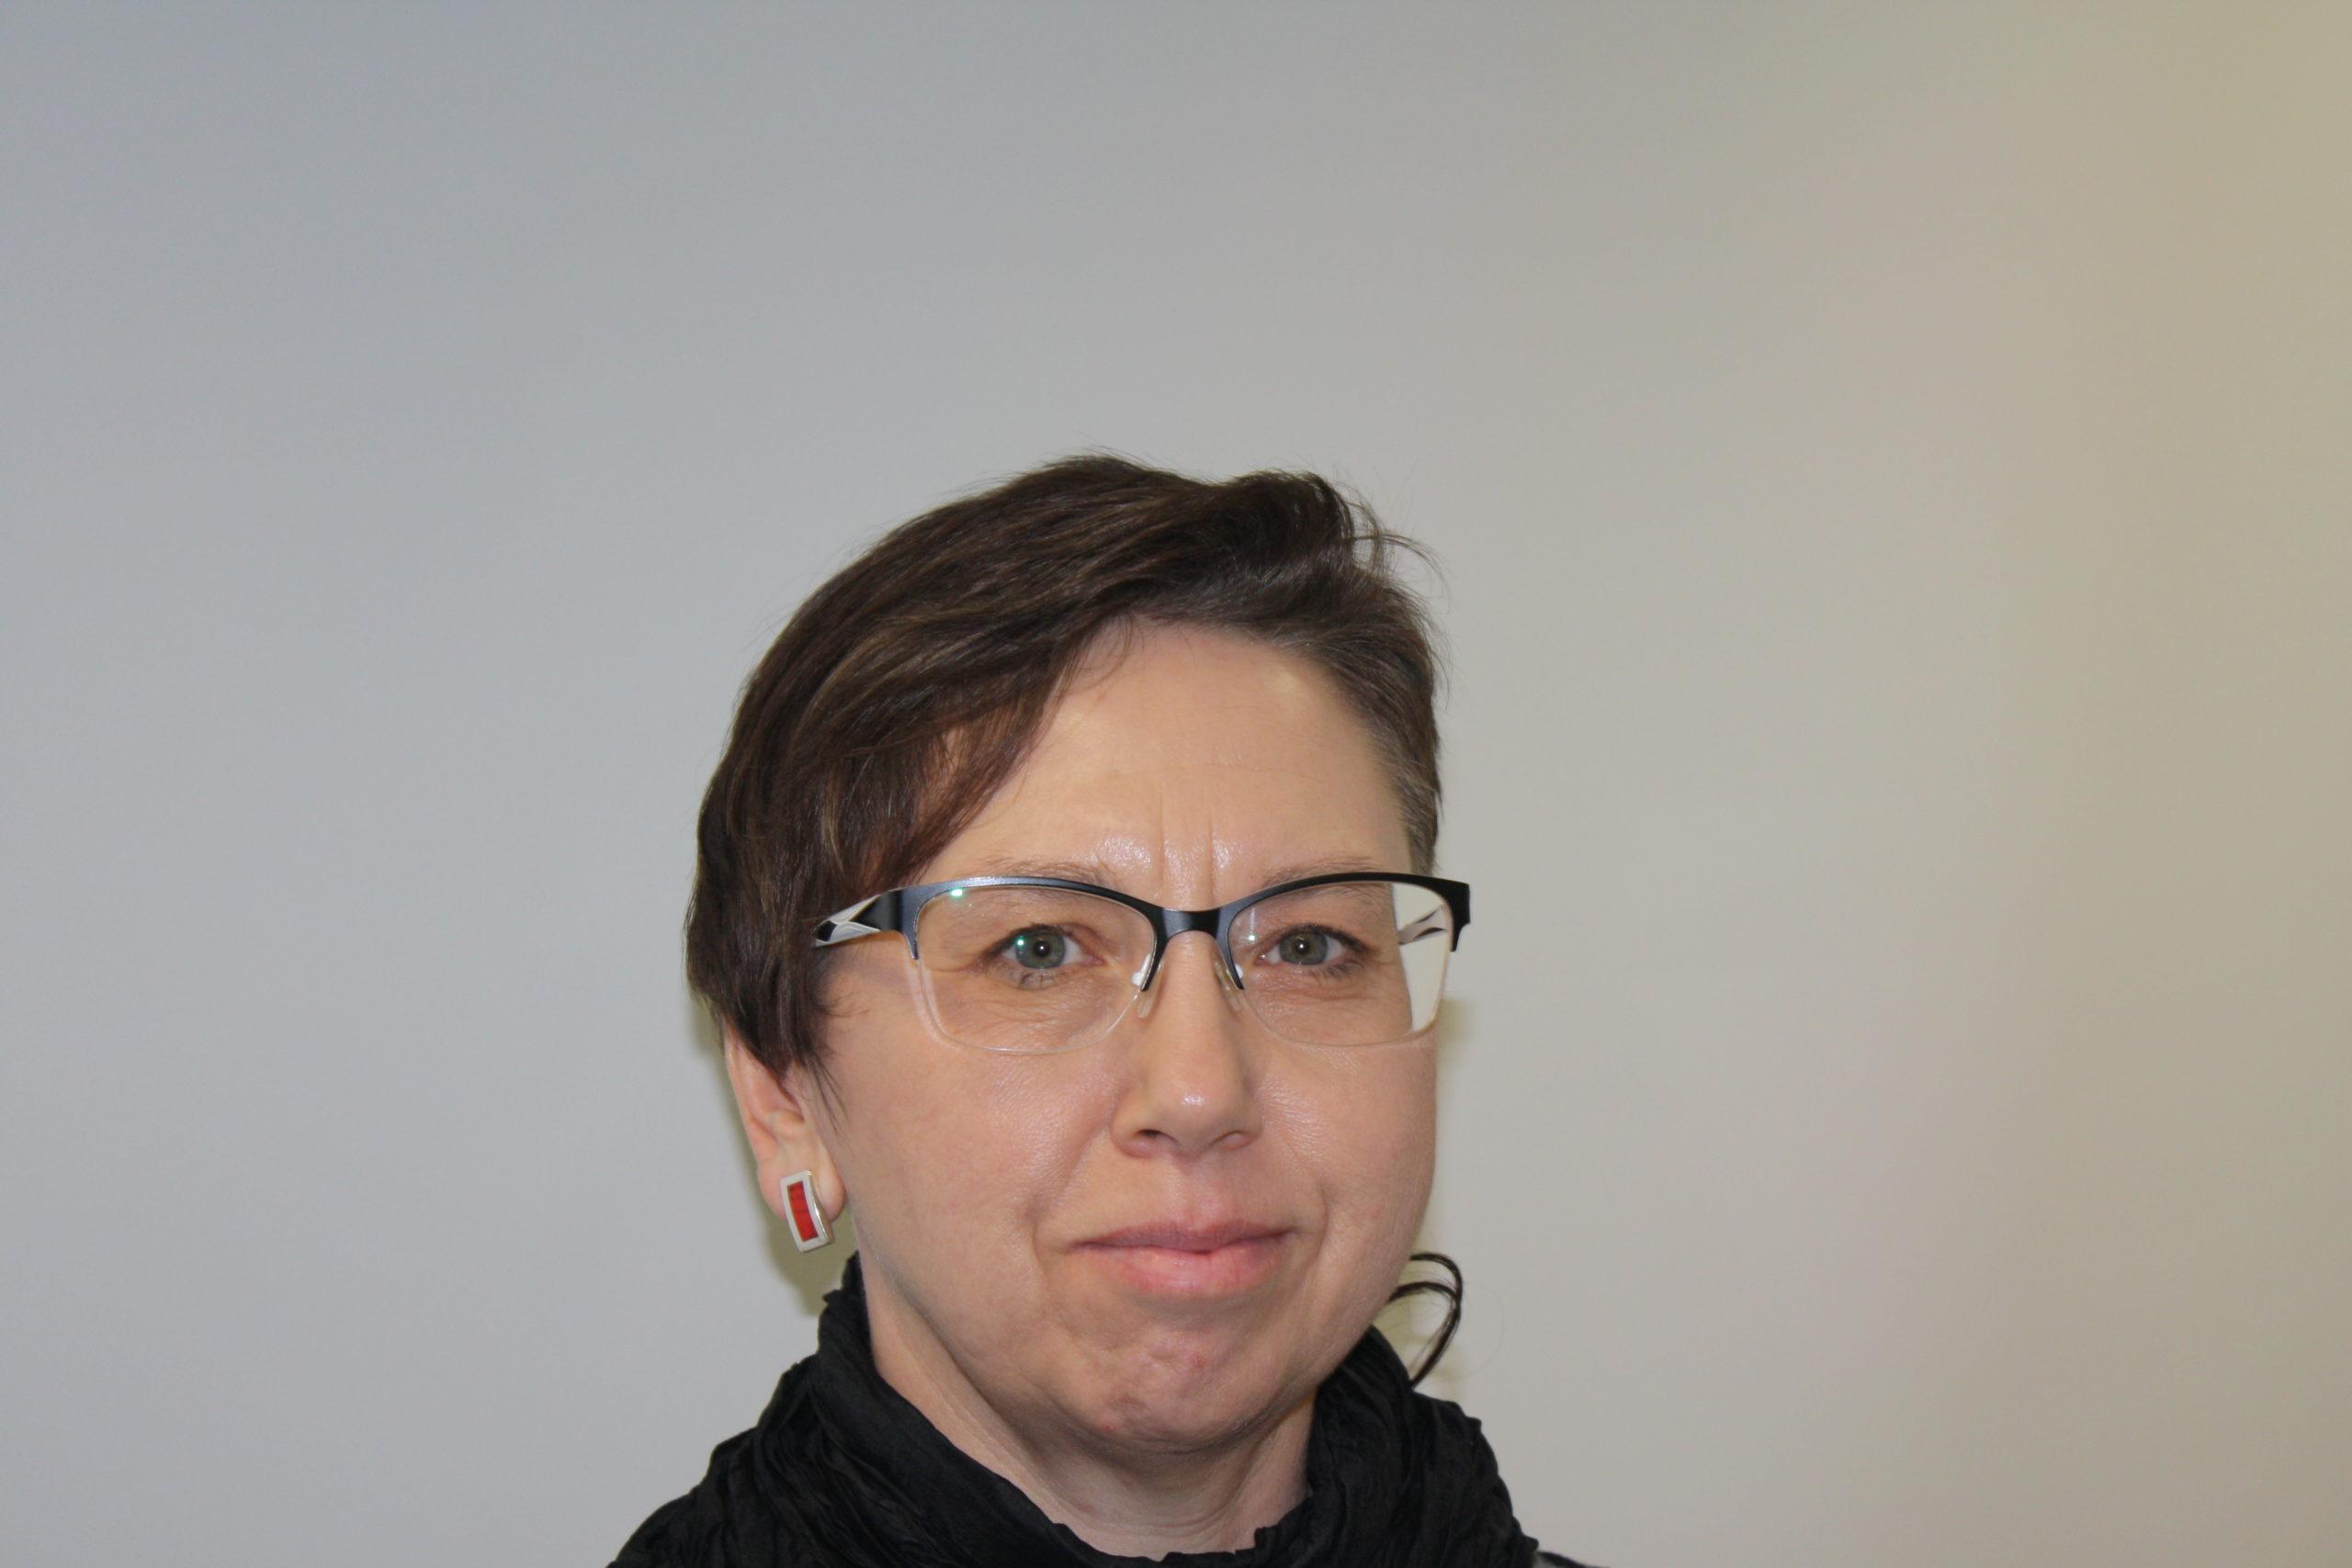 Dorette Seifert